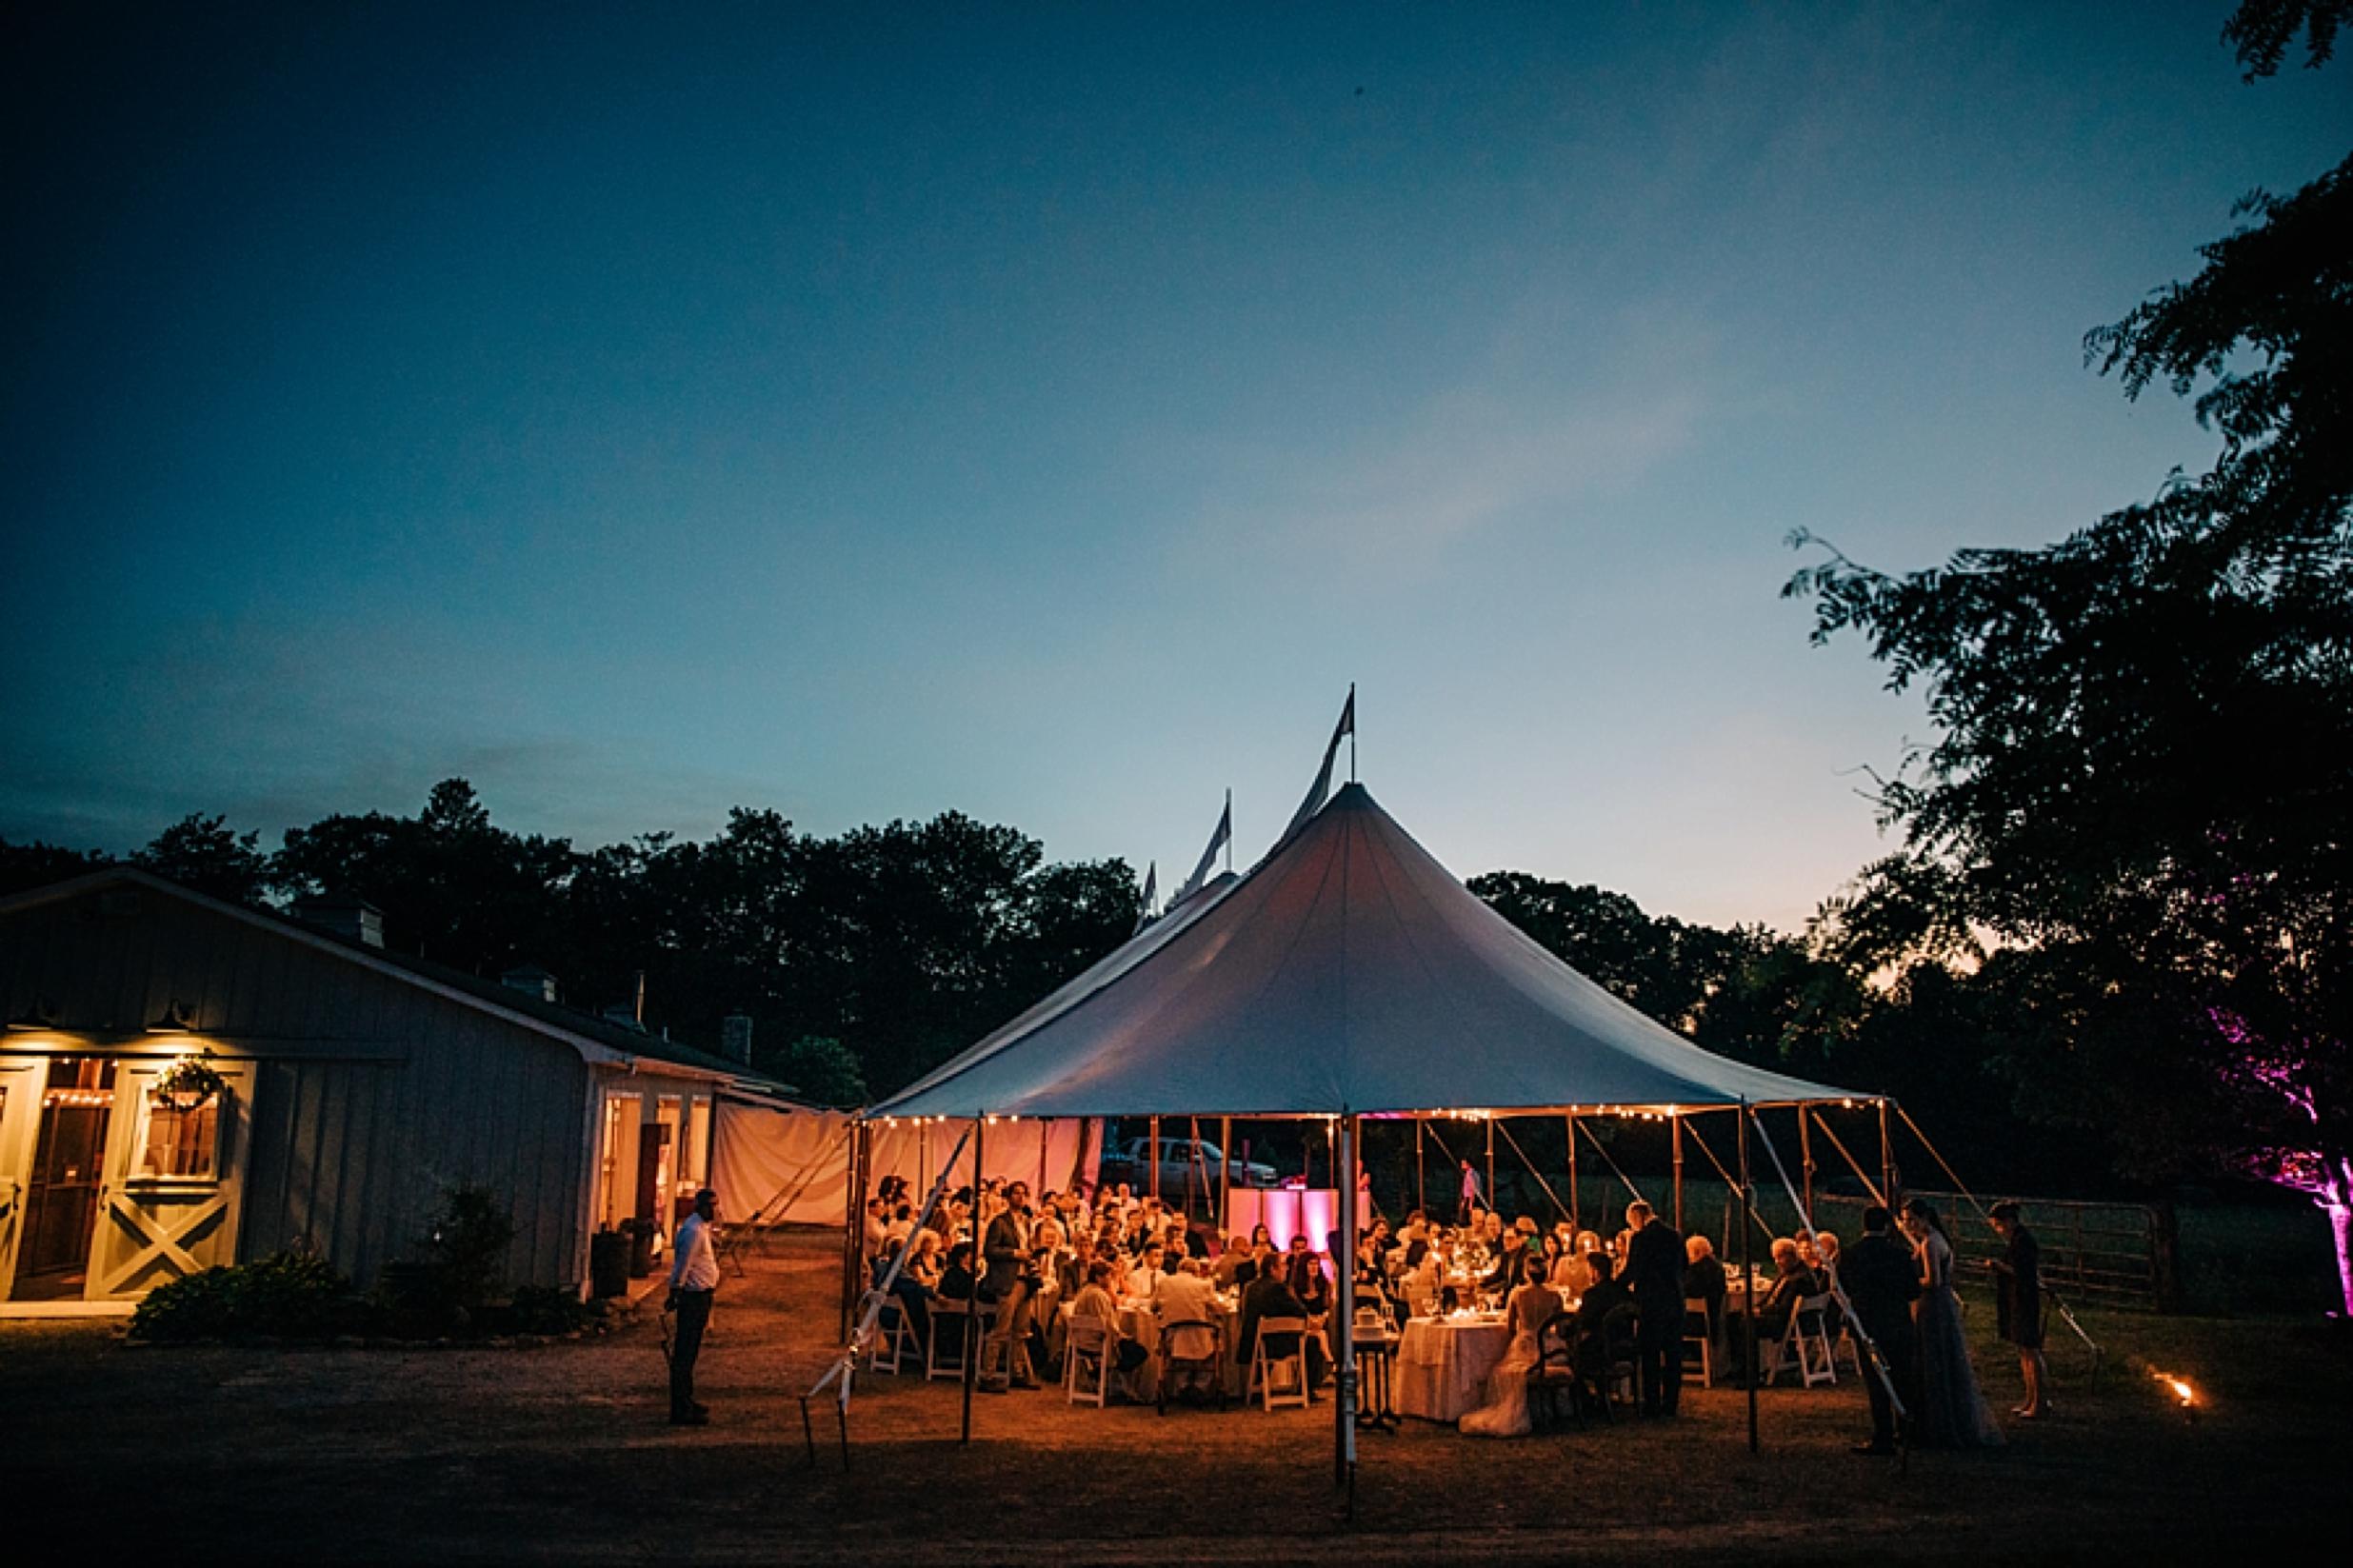 historic-upstate-ny-wedding-church-backyard-photographer_0058.jpg